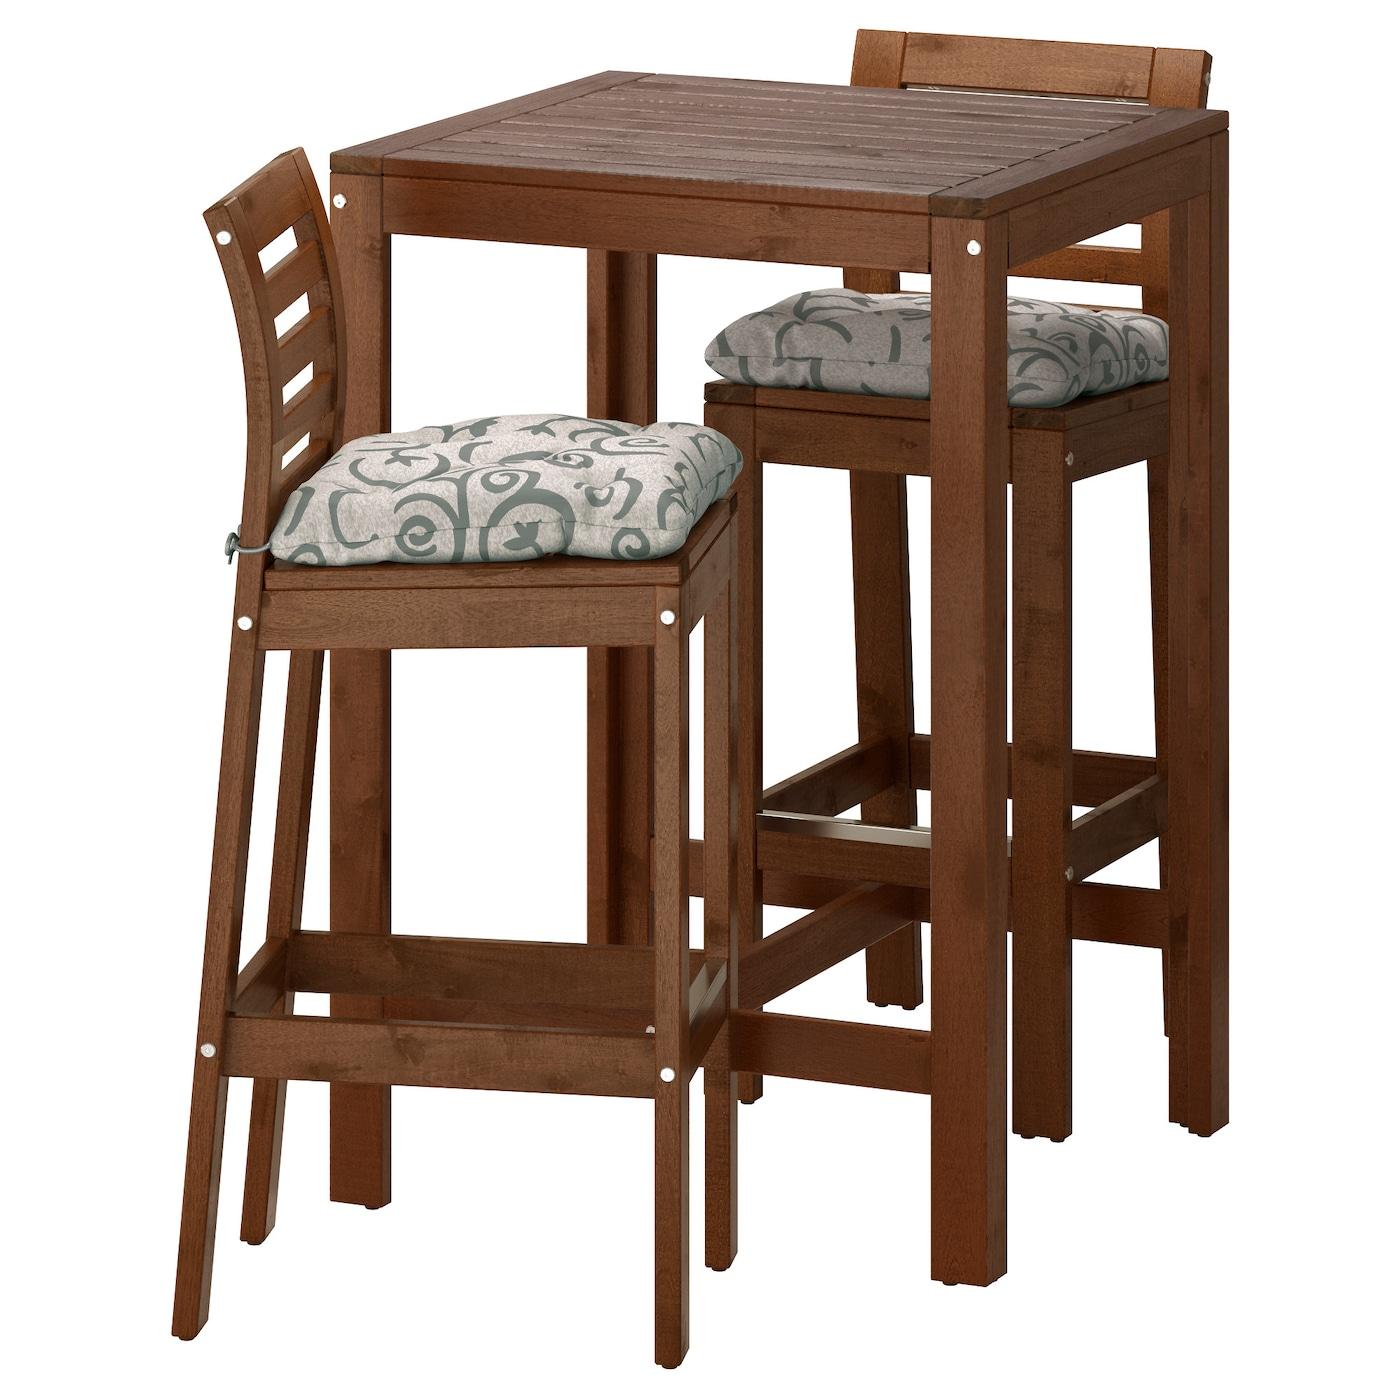 Ikea ÄpplarÖ Bar Table And 2 Stools